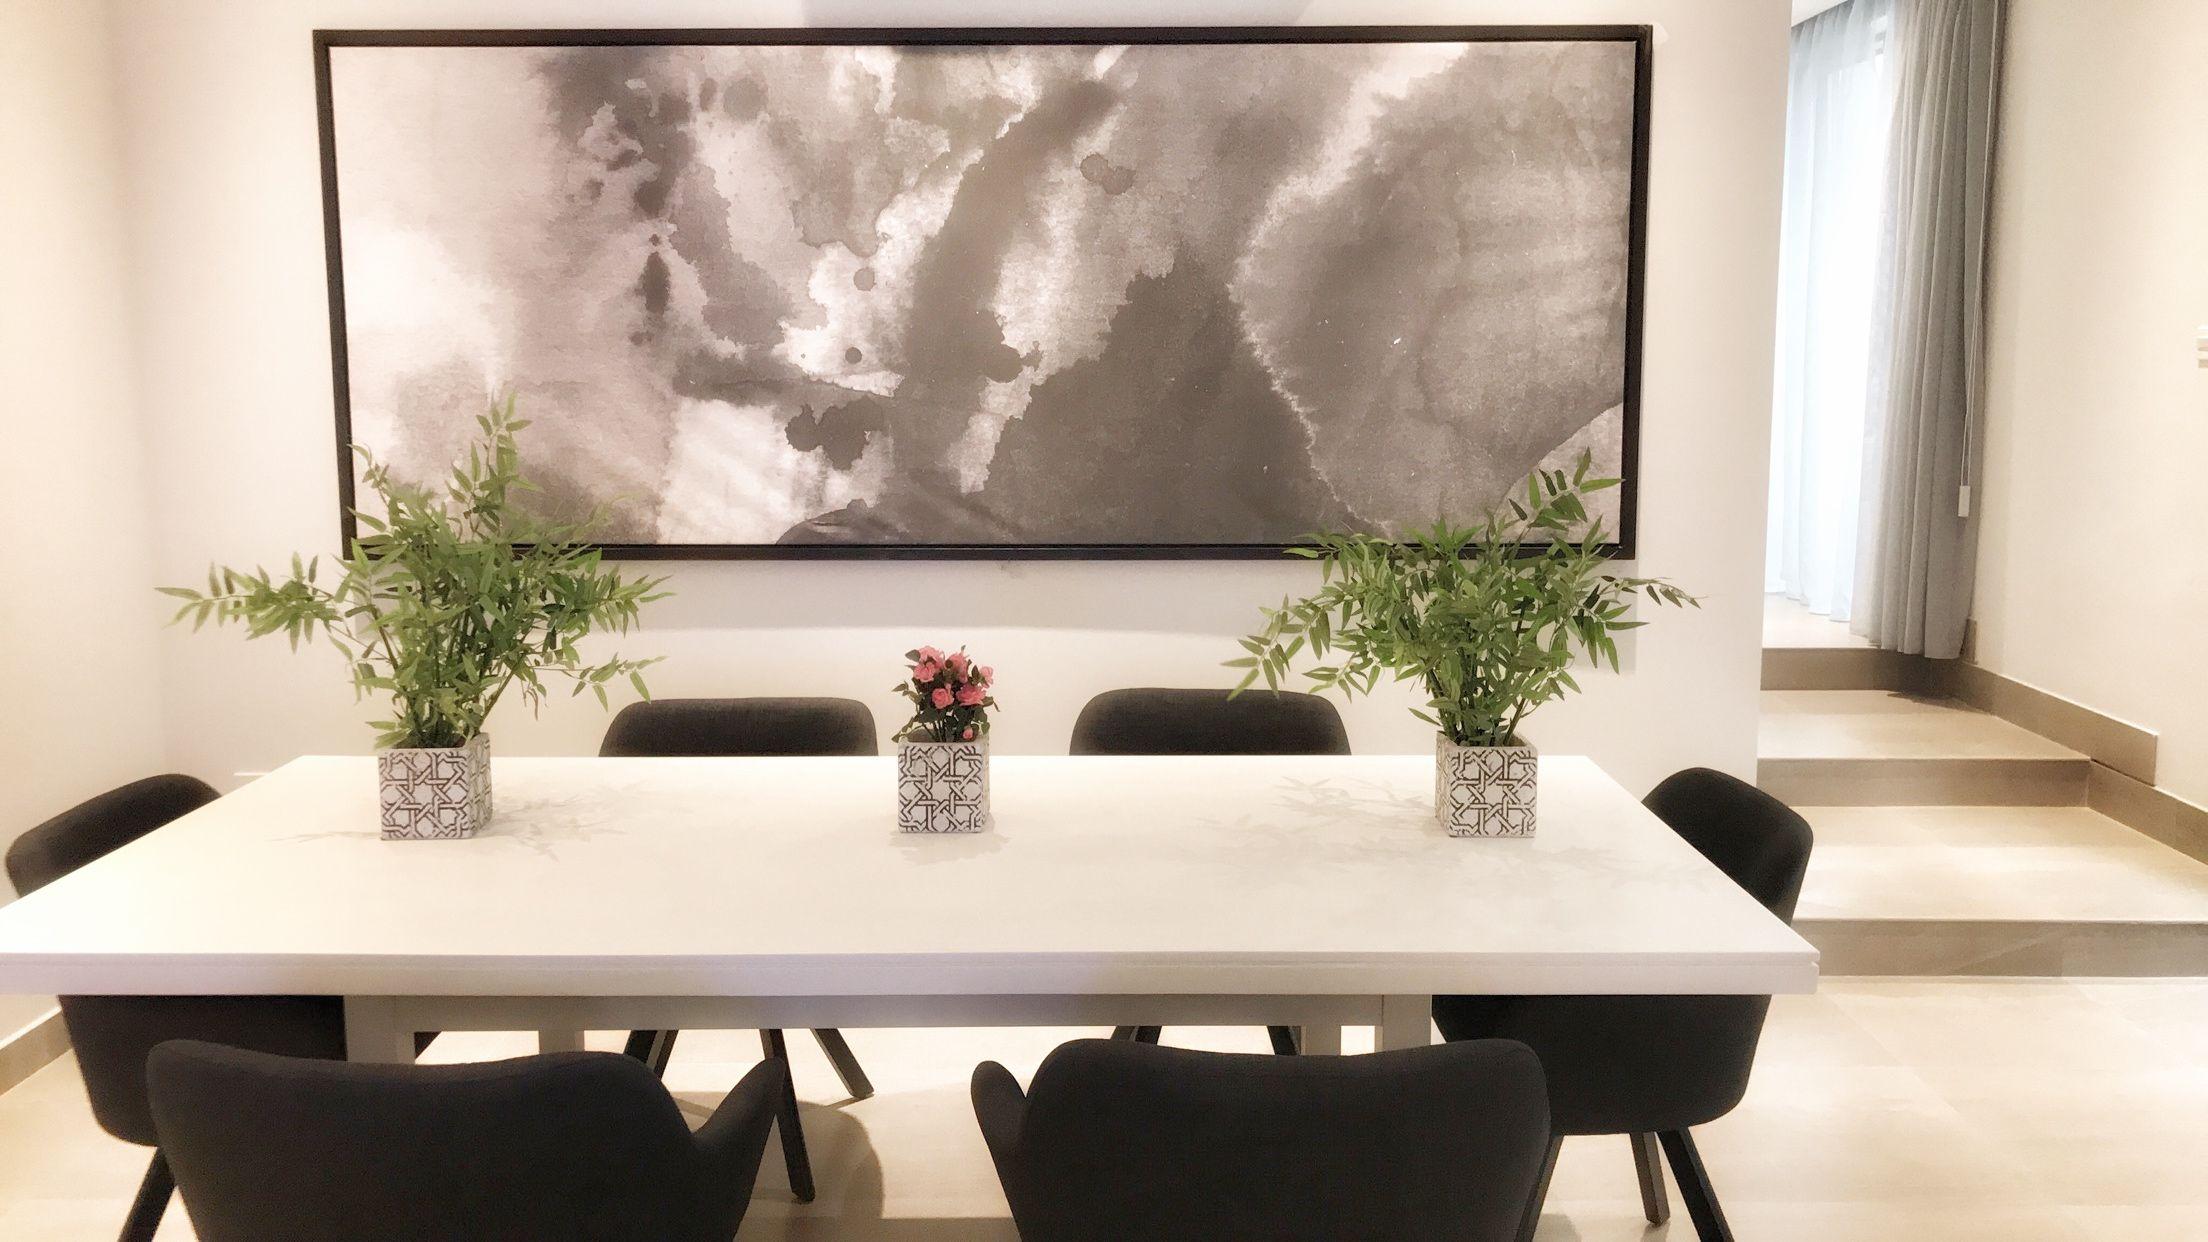 Style Villa فيلا العرض رقم 5 تفاصيل صغيرة تمنح نا التميز للاستفسار 0557424242 السعودية Saudi Aramco الخبر Khobar الدمام Home Decor Decor Furniture